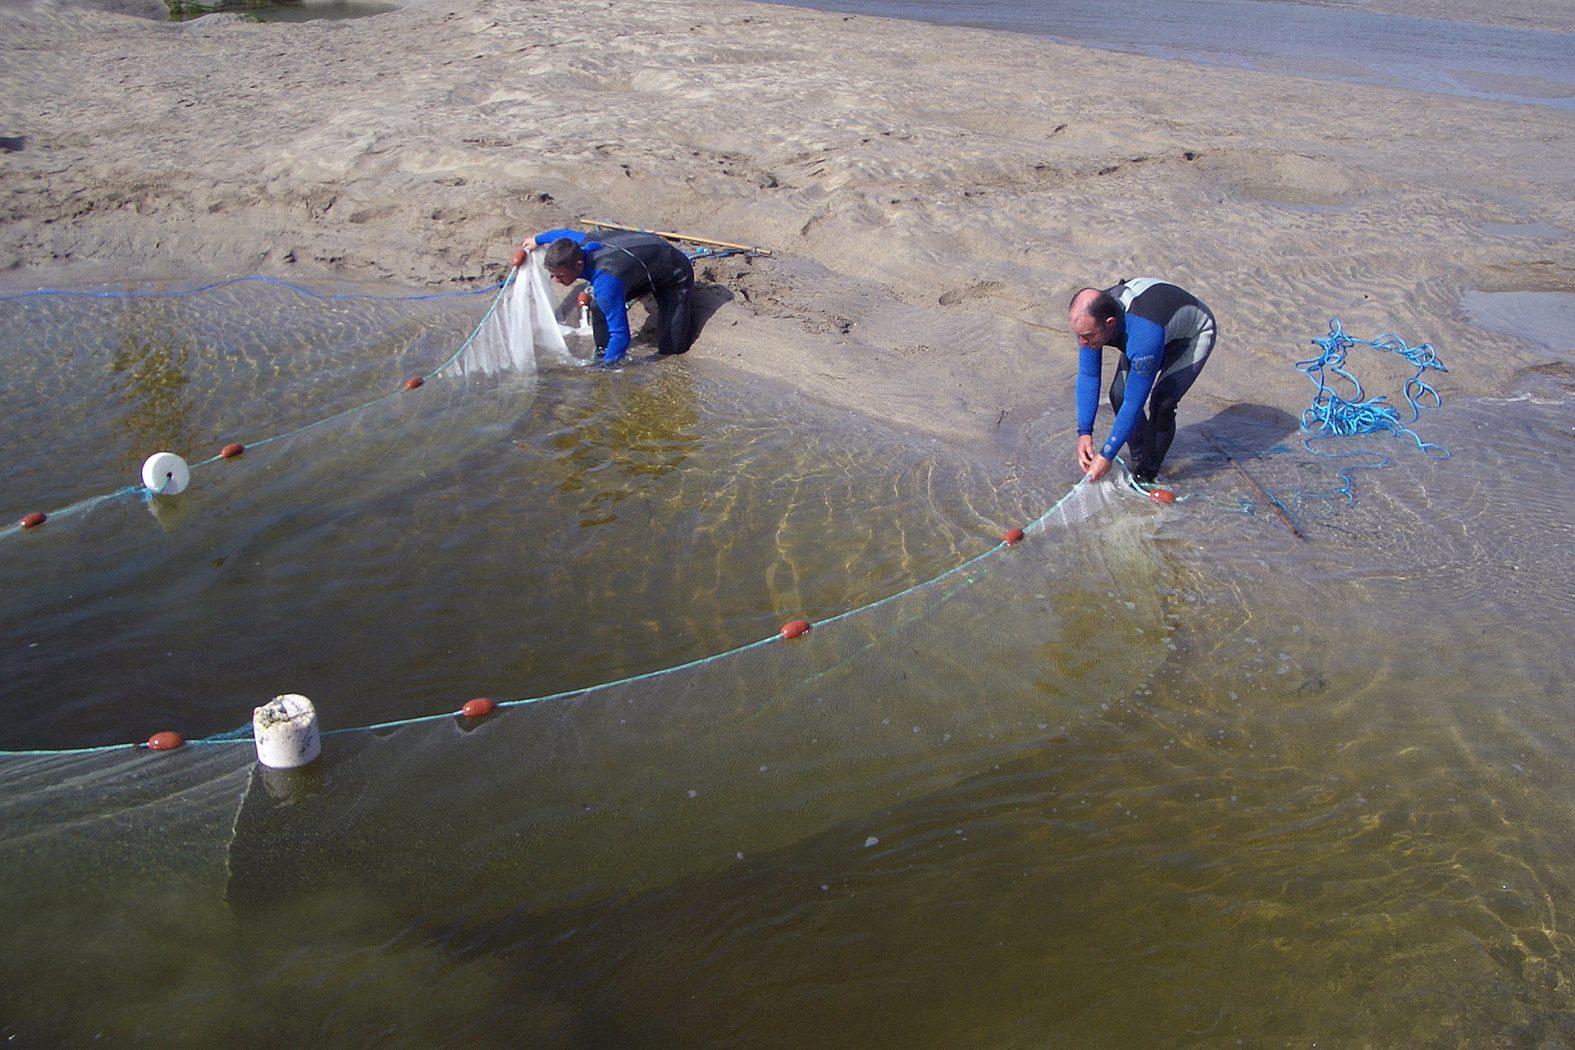 Sandaale fangen mit Netz